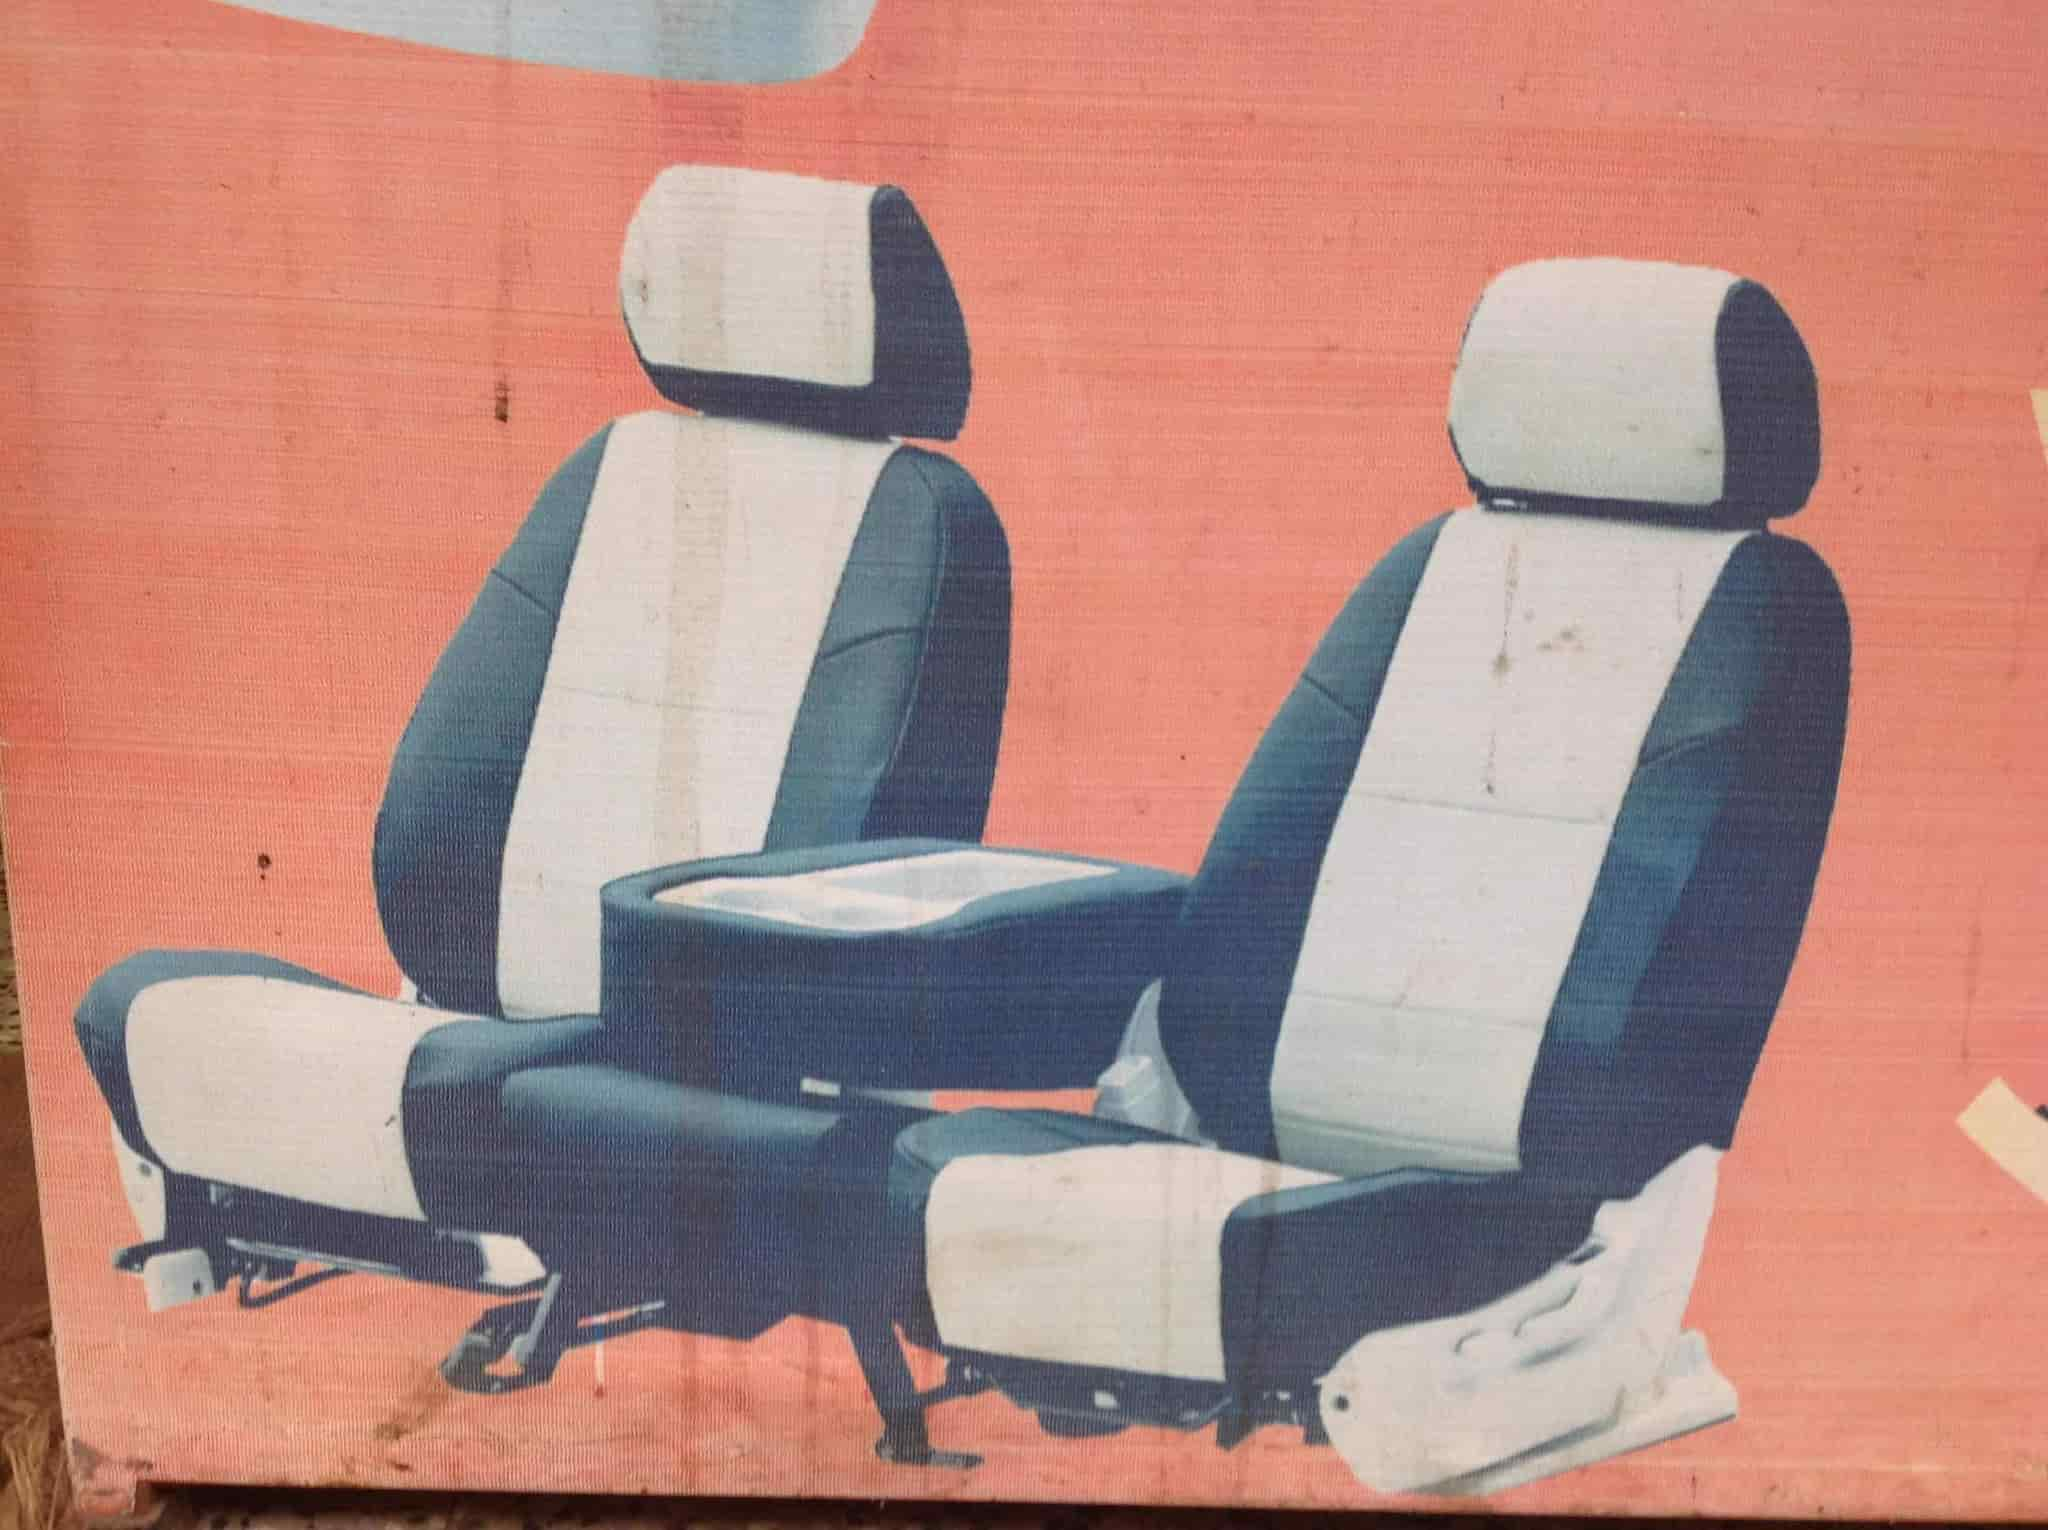 Tip Top Coaching Works Shahupuri Sofa Set Repair Services In